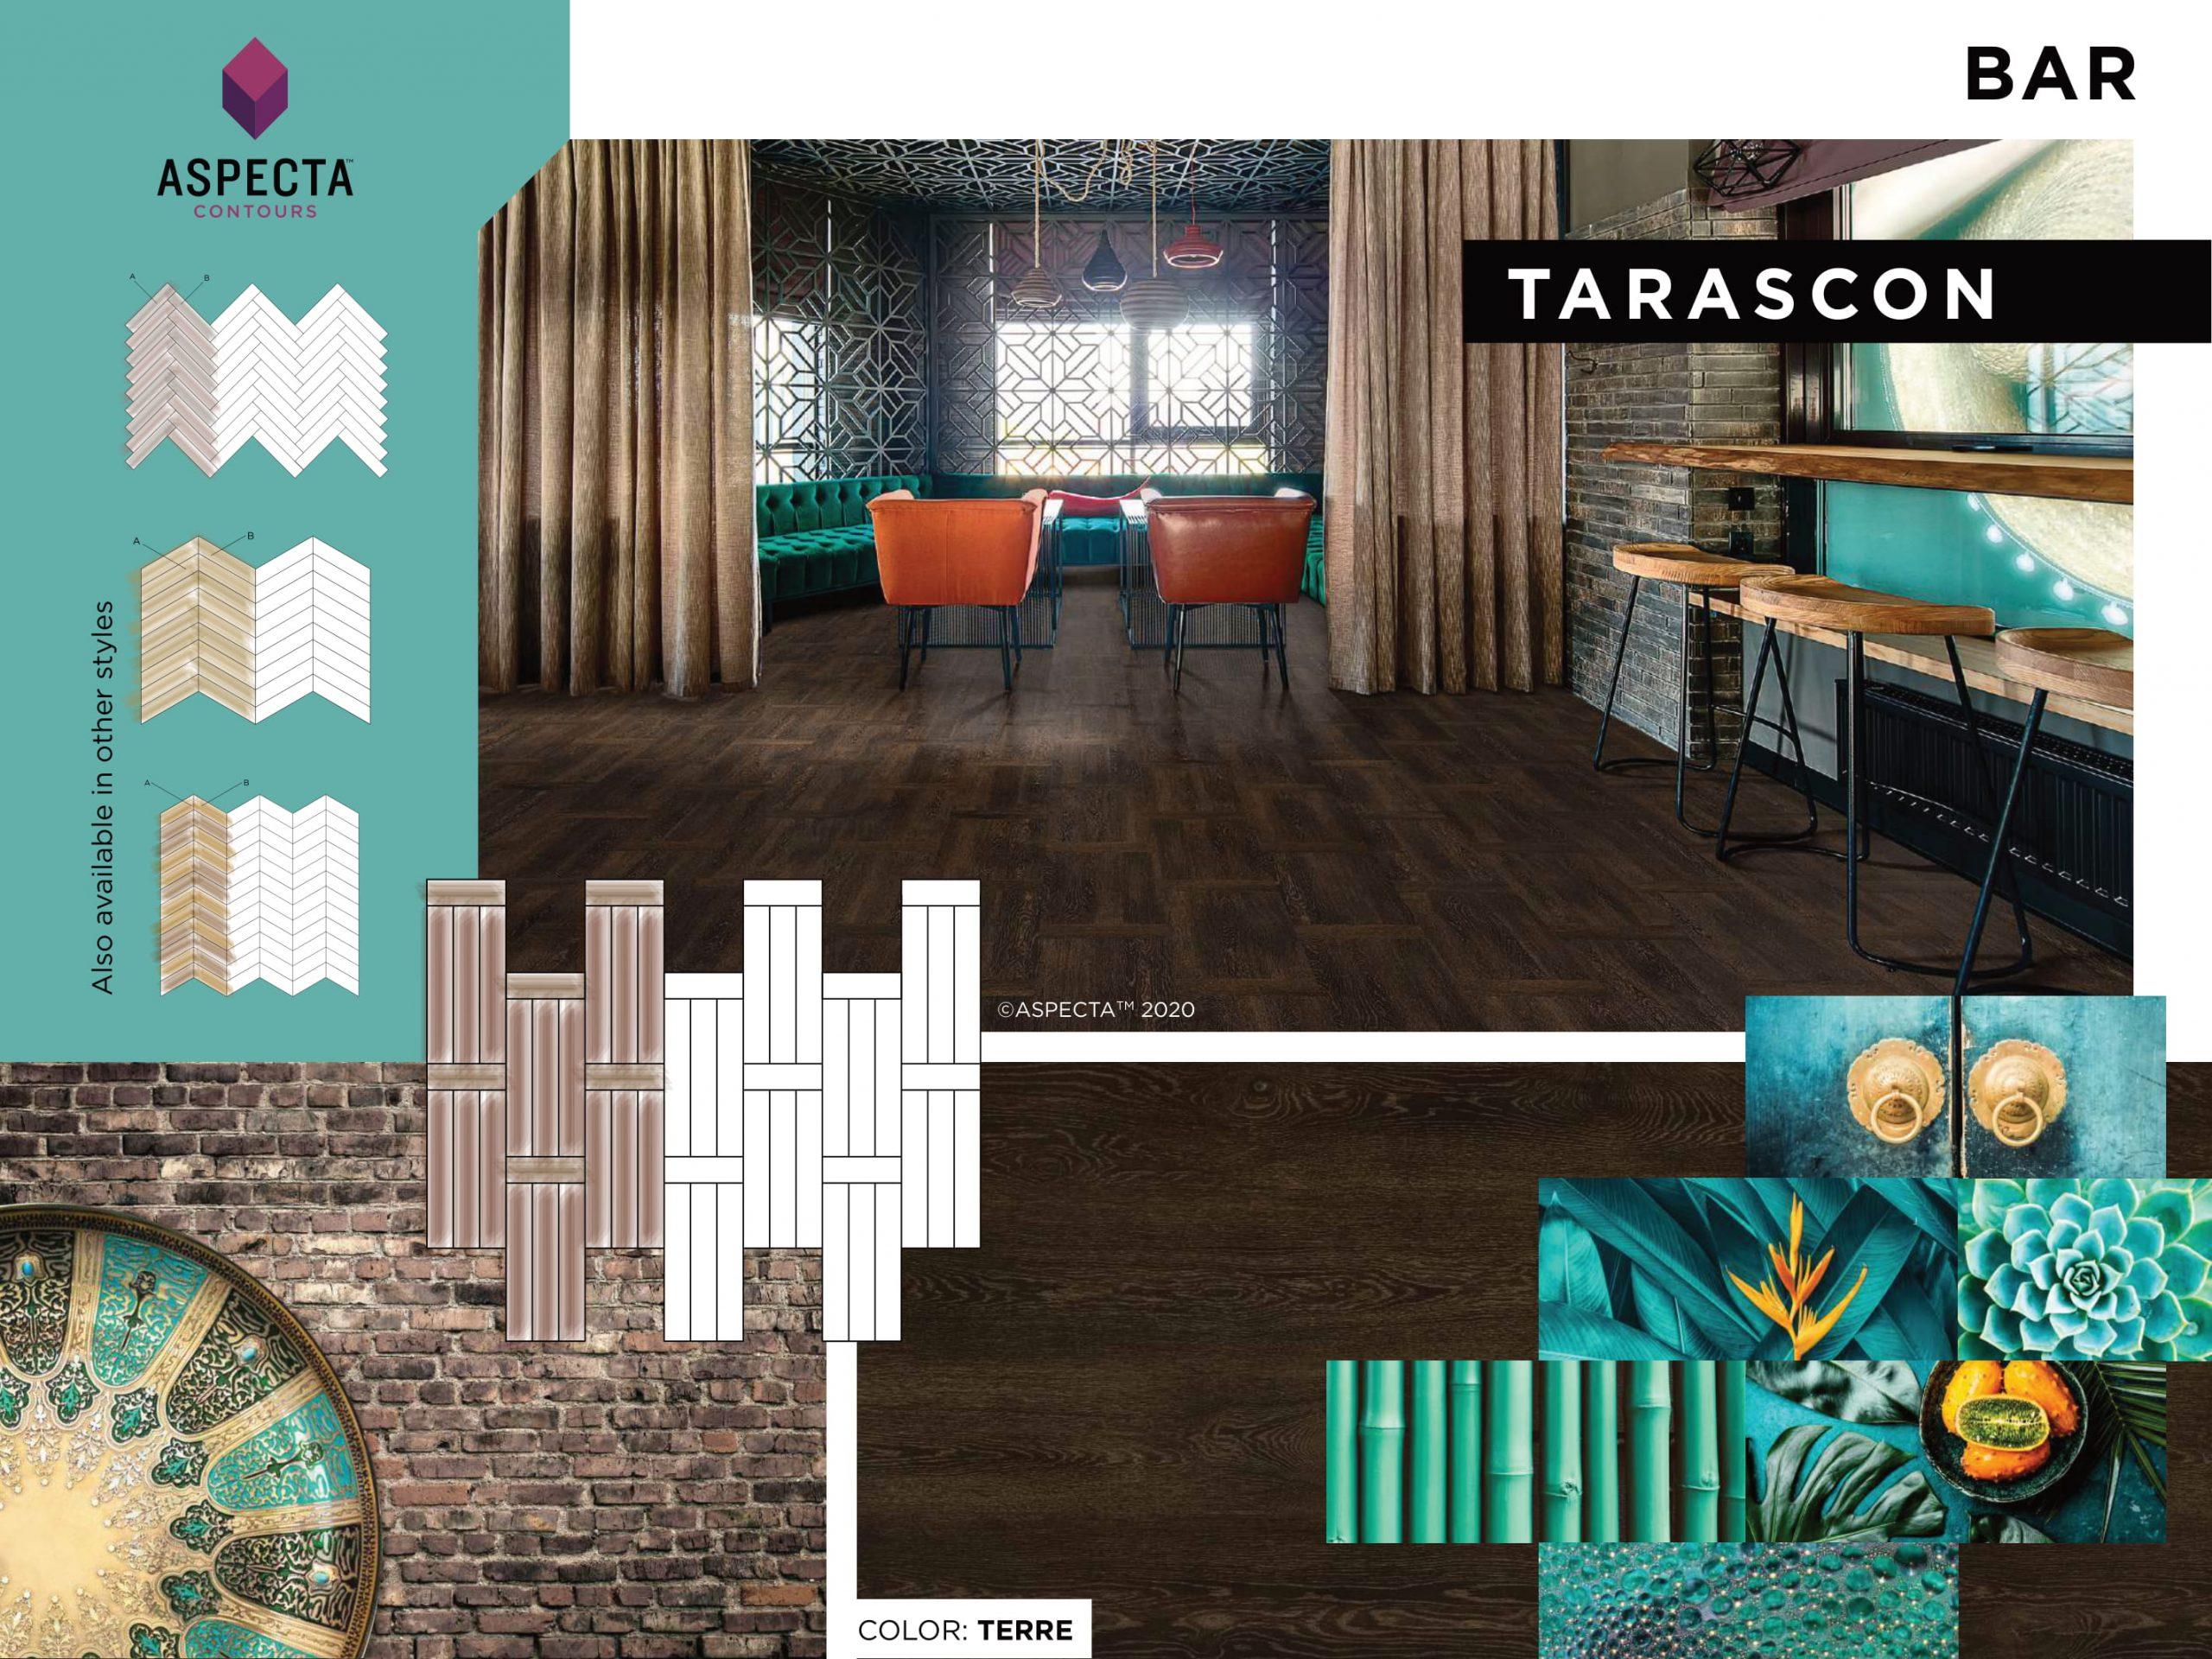 06_ASP_Contours_Moodboard_Tarascon_Bar_05_2020-1